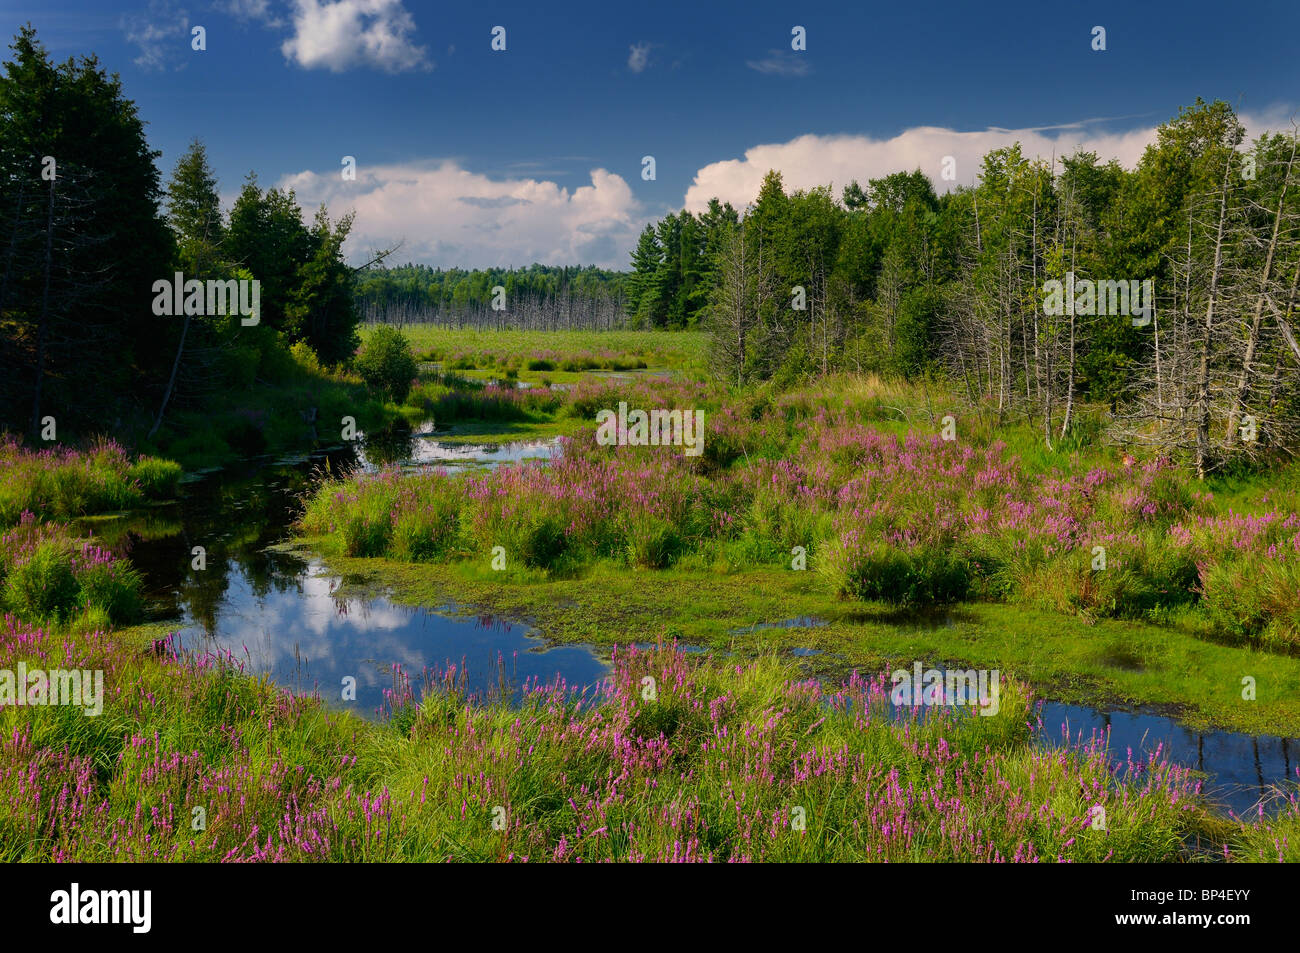 Purple loosestrife along marsh creek in the wild country near Brooke Ontario Canada - Stock Image